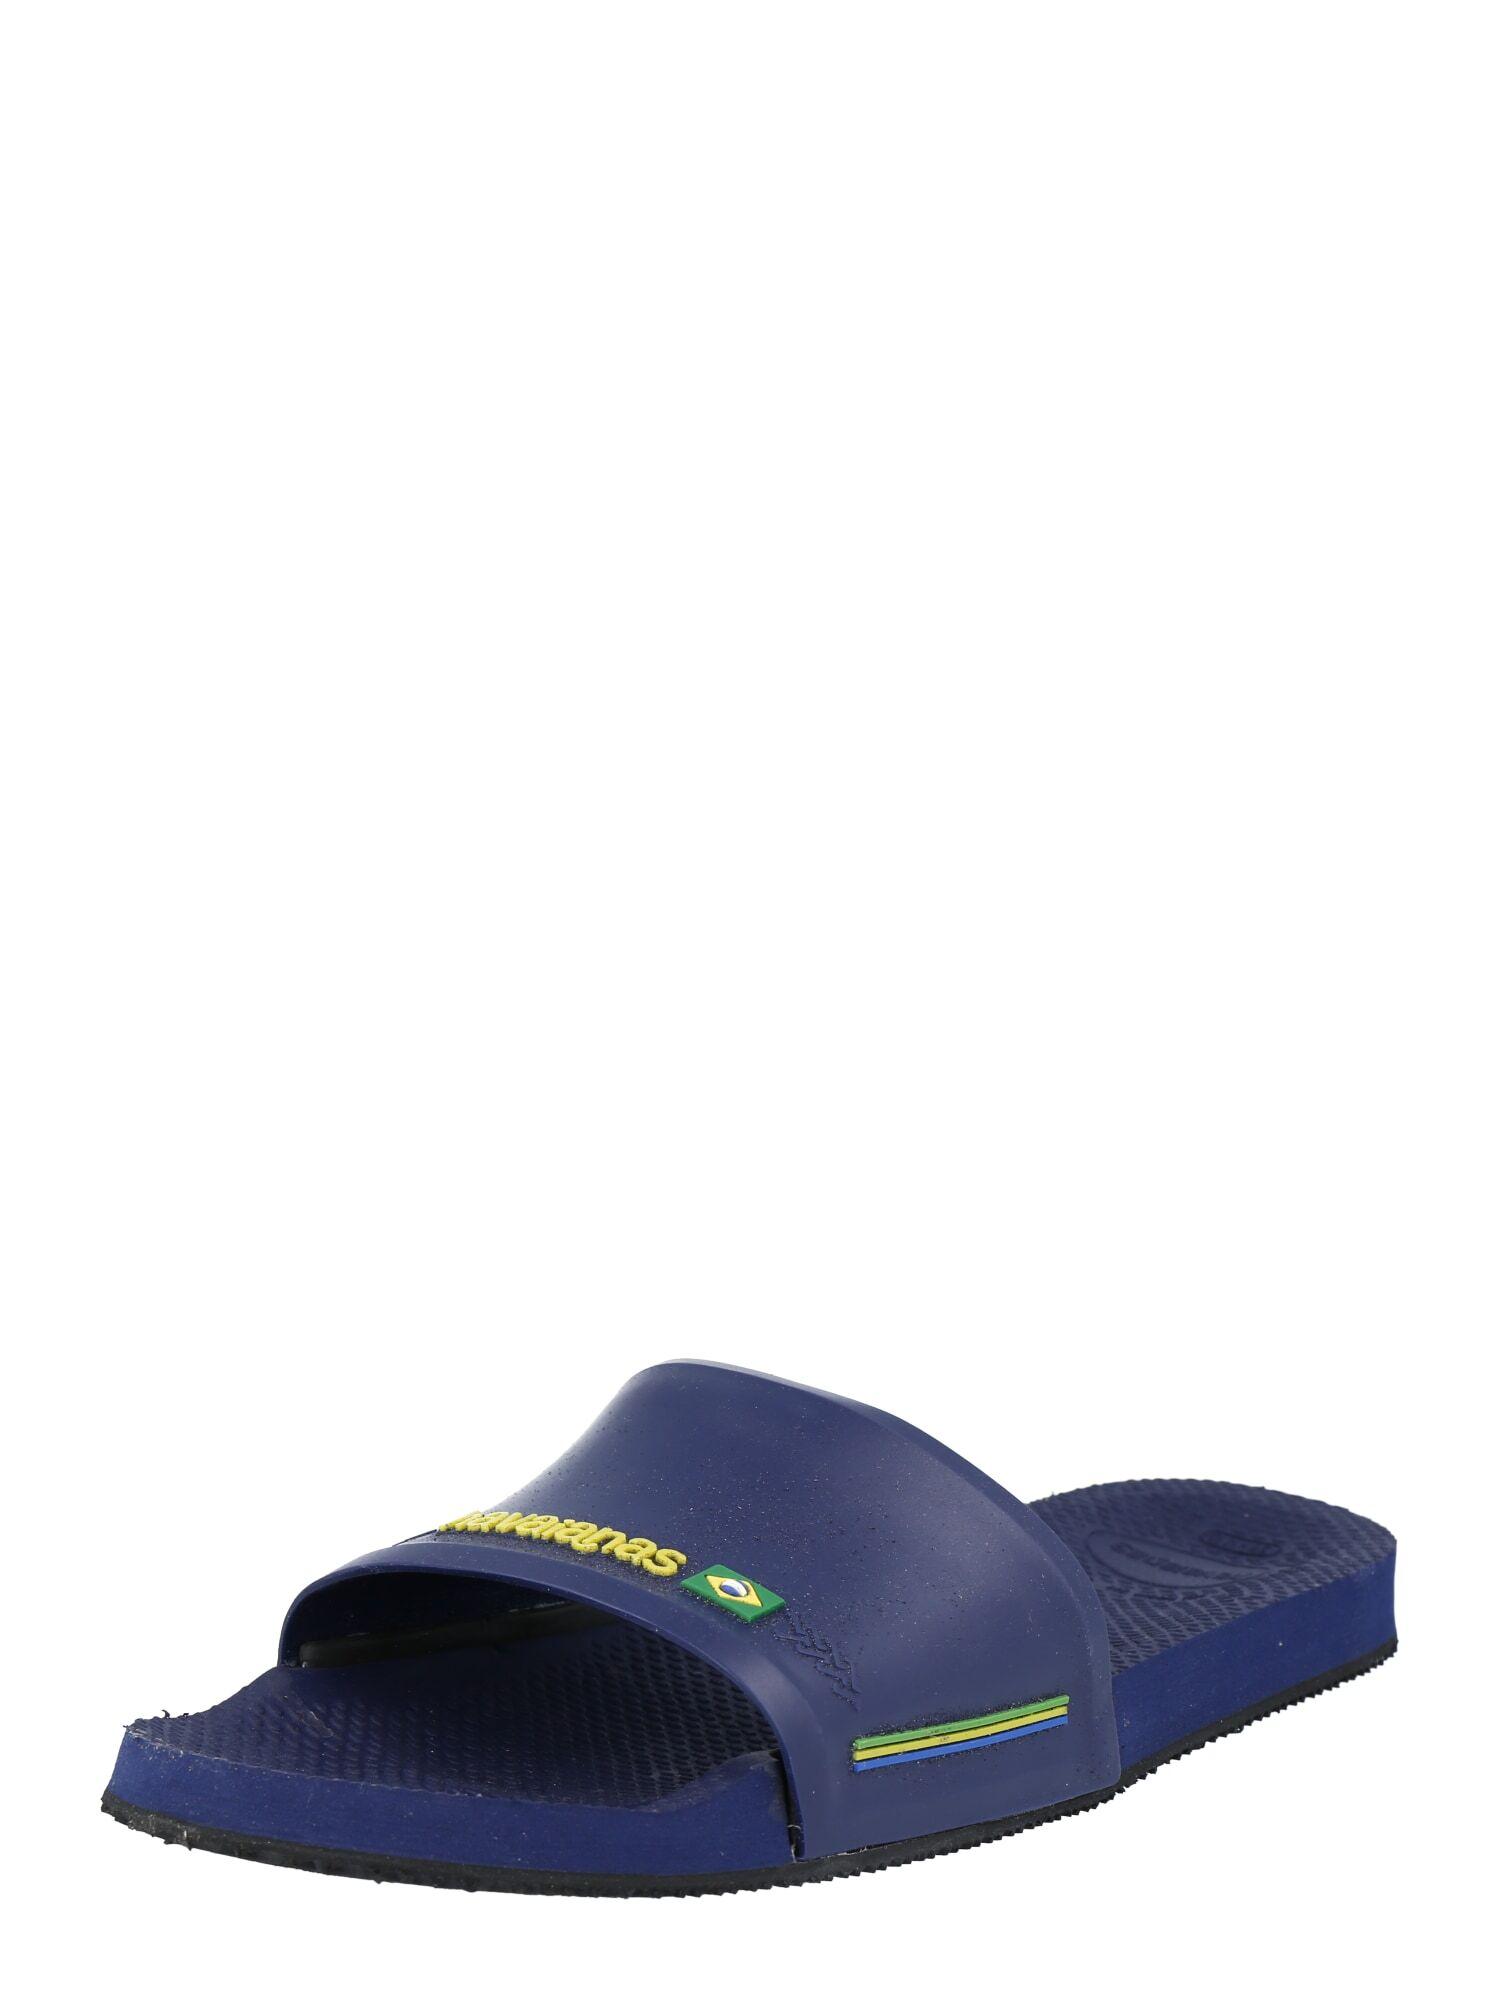 HAVAIANAS Mule 'Slide Brasil'  - Bleu - Taille: 35-36 - male